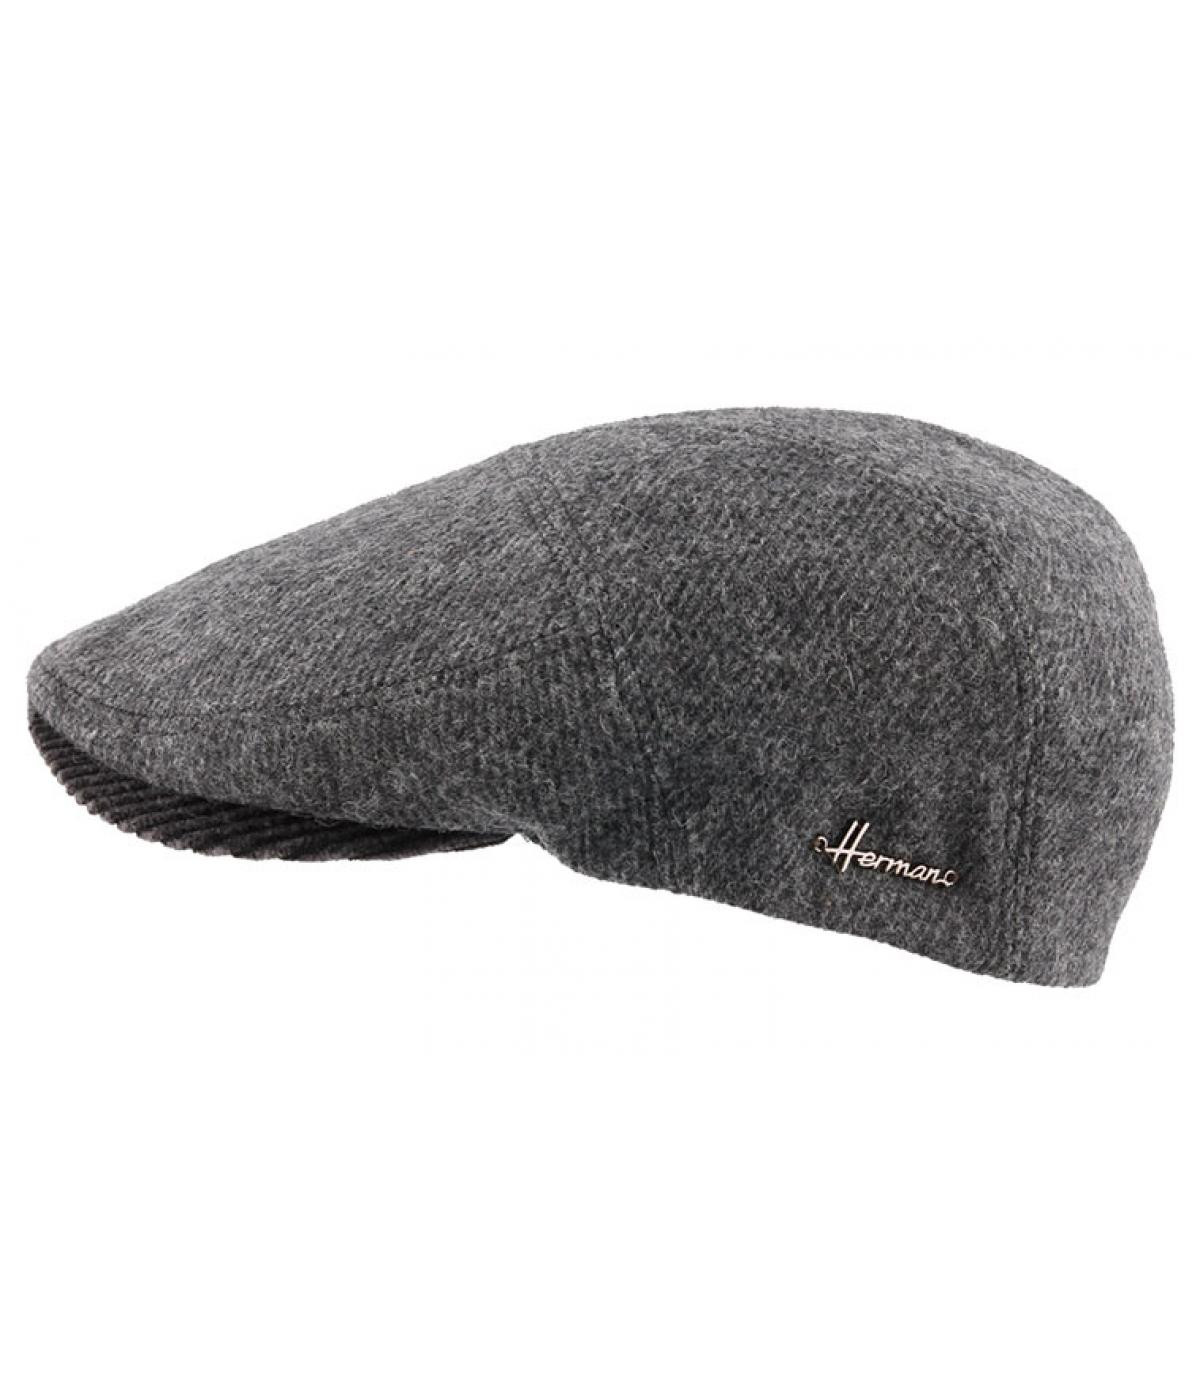 Details Dispatch Wool Corduroy grey - afbeeling 2